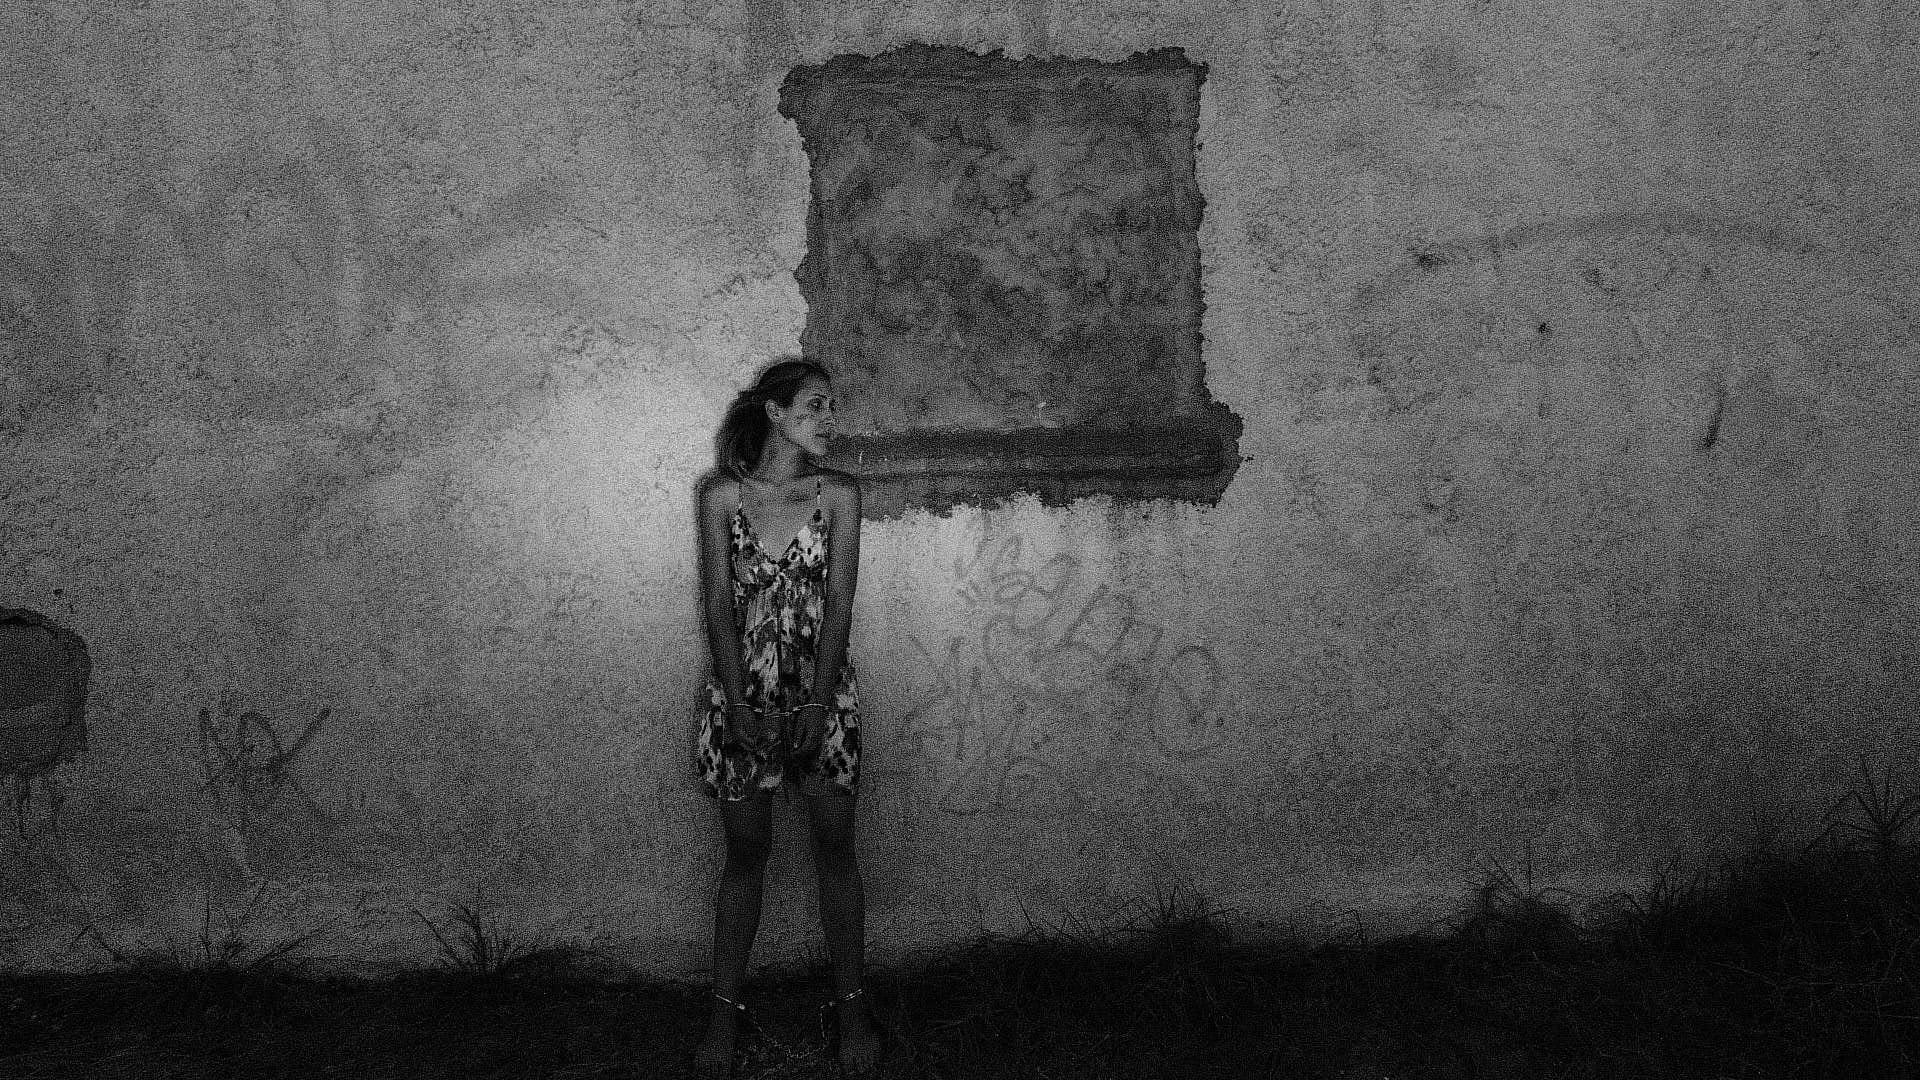 Photography by AnnaLynne McCord